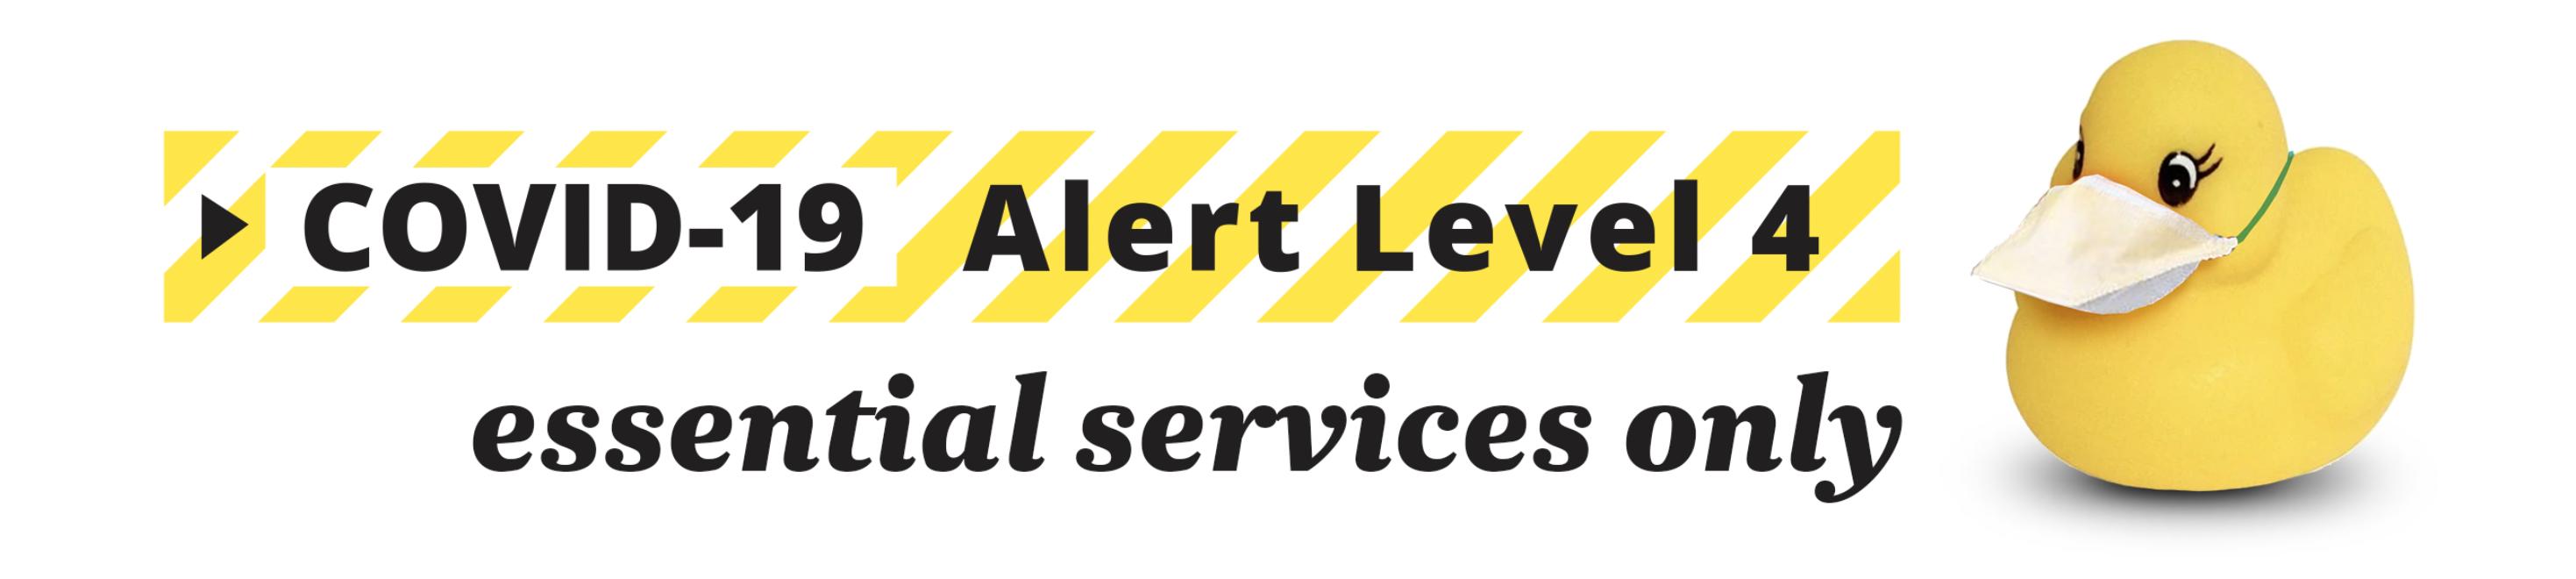 Alert Level 4 header